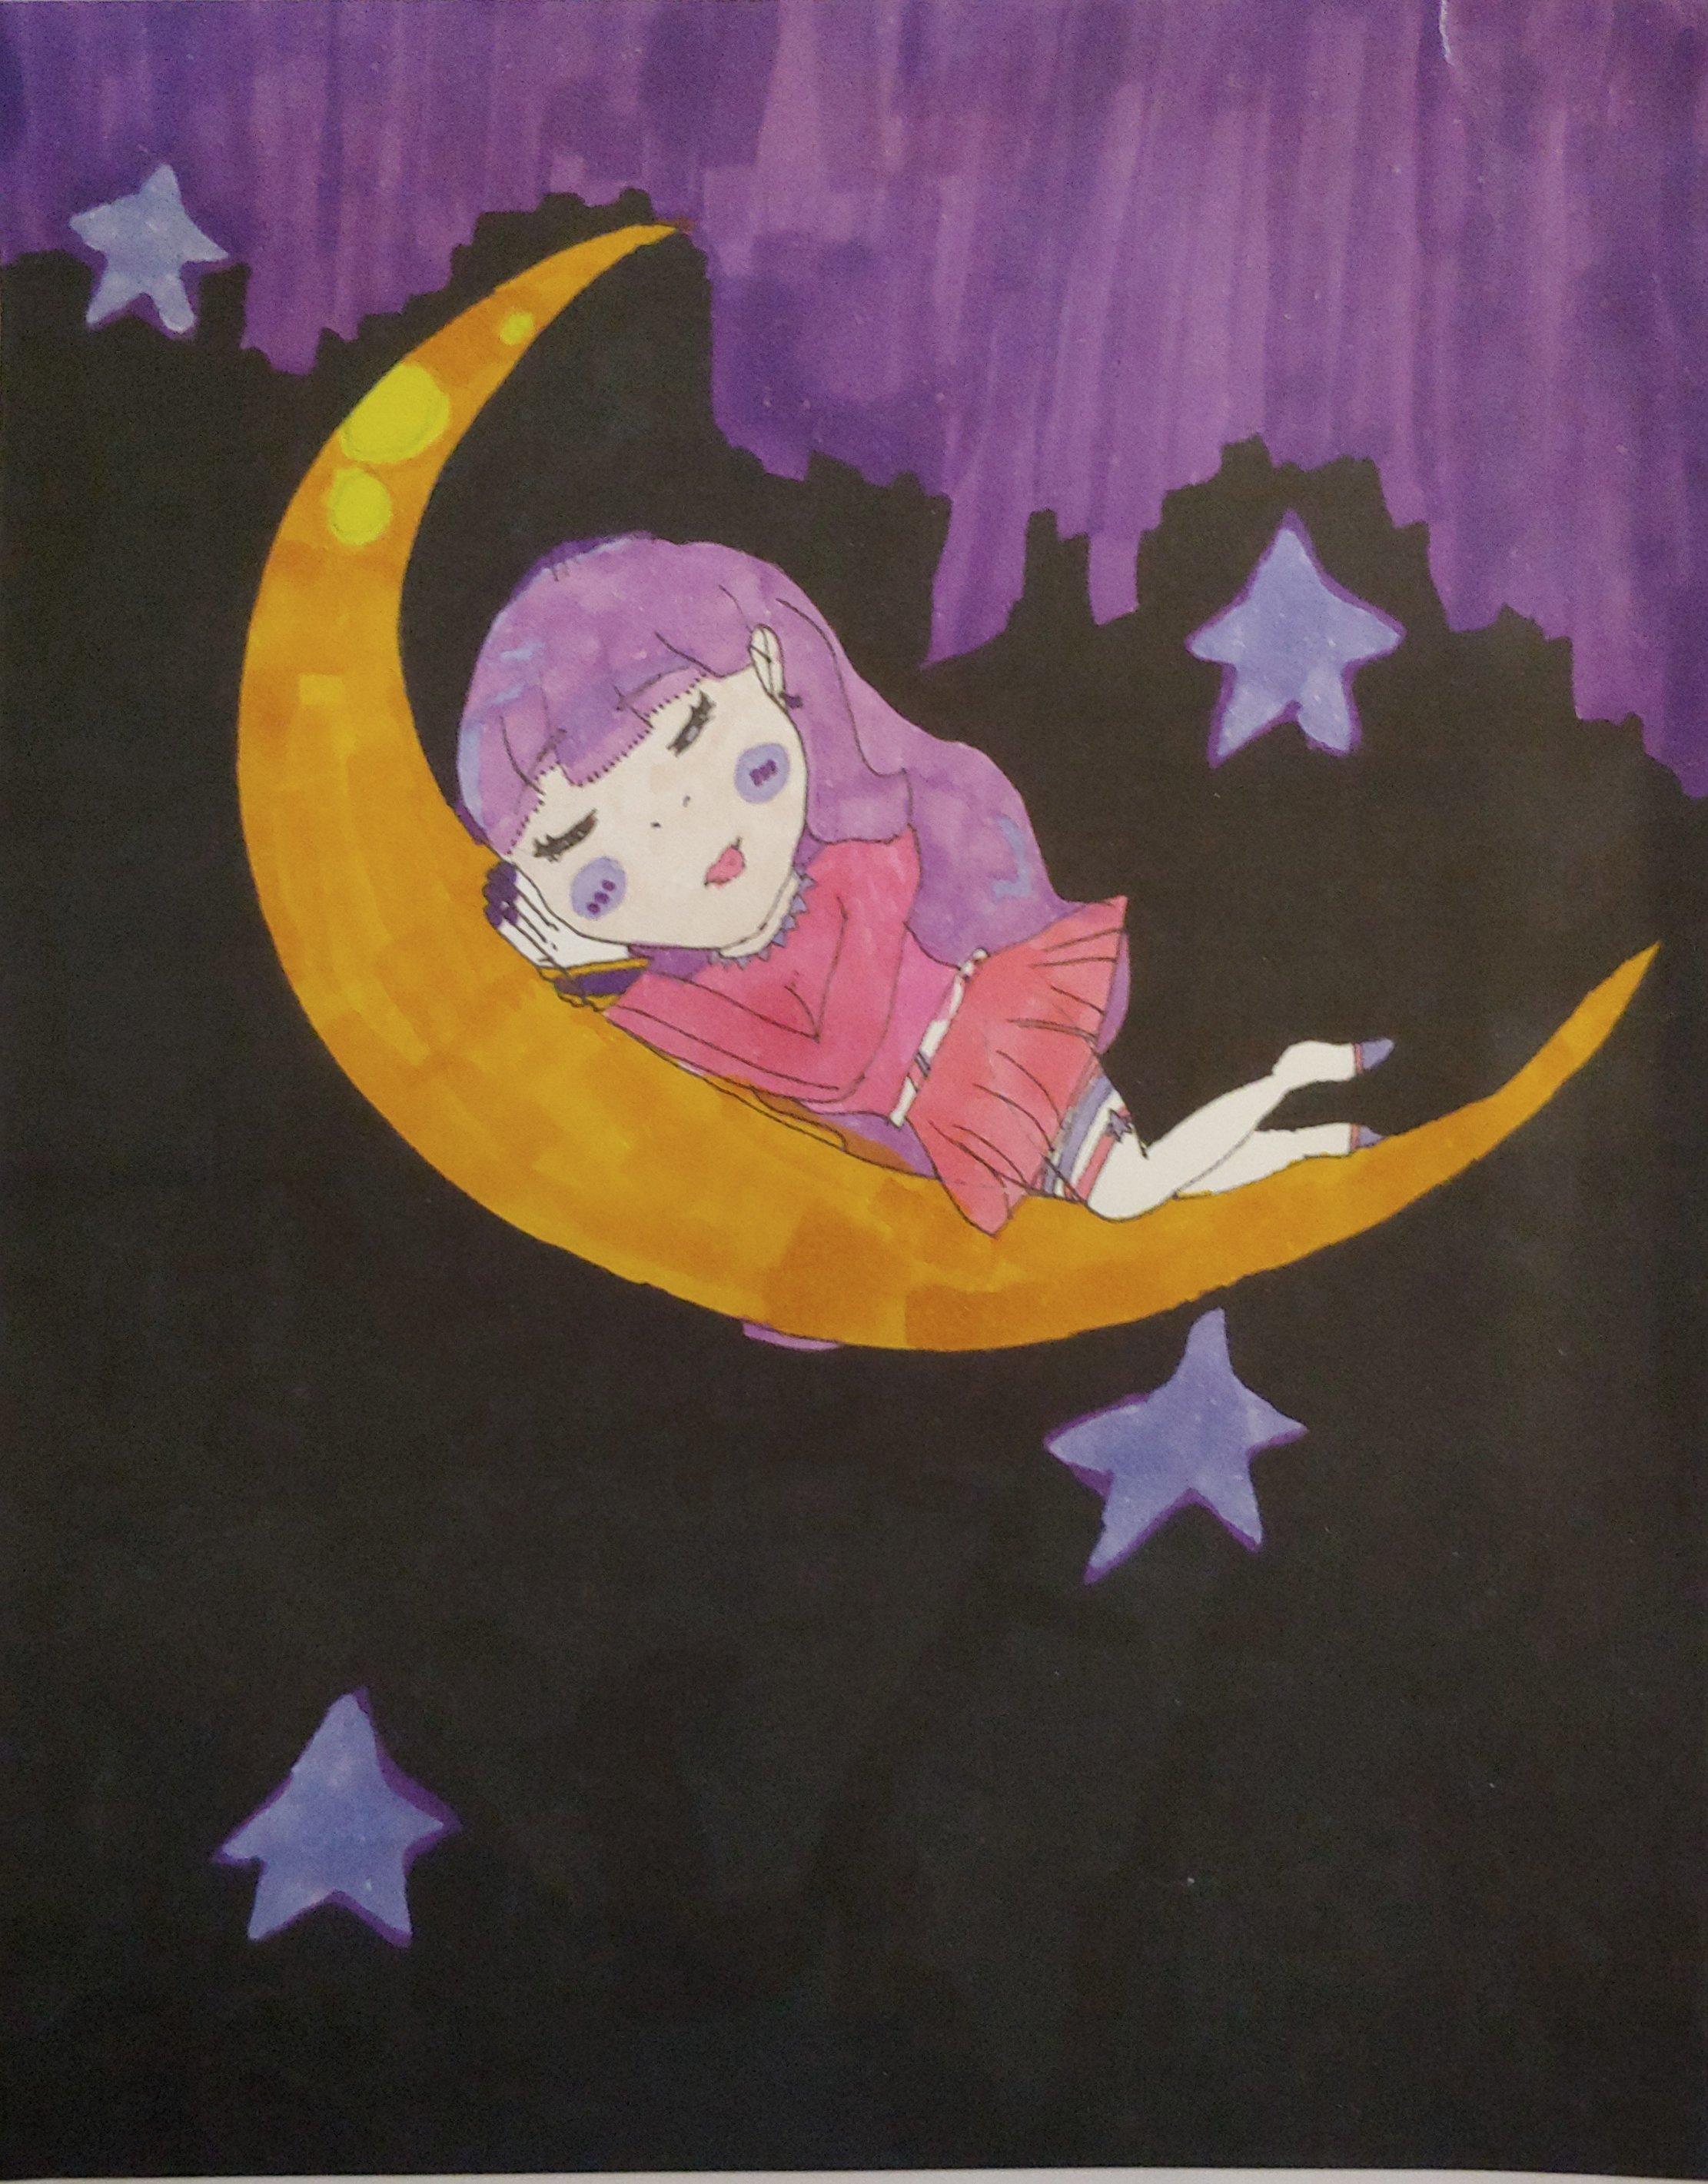 A sleepy night